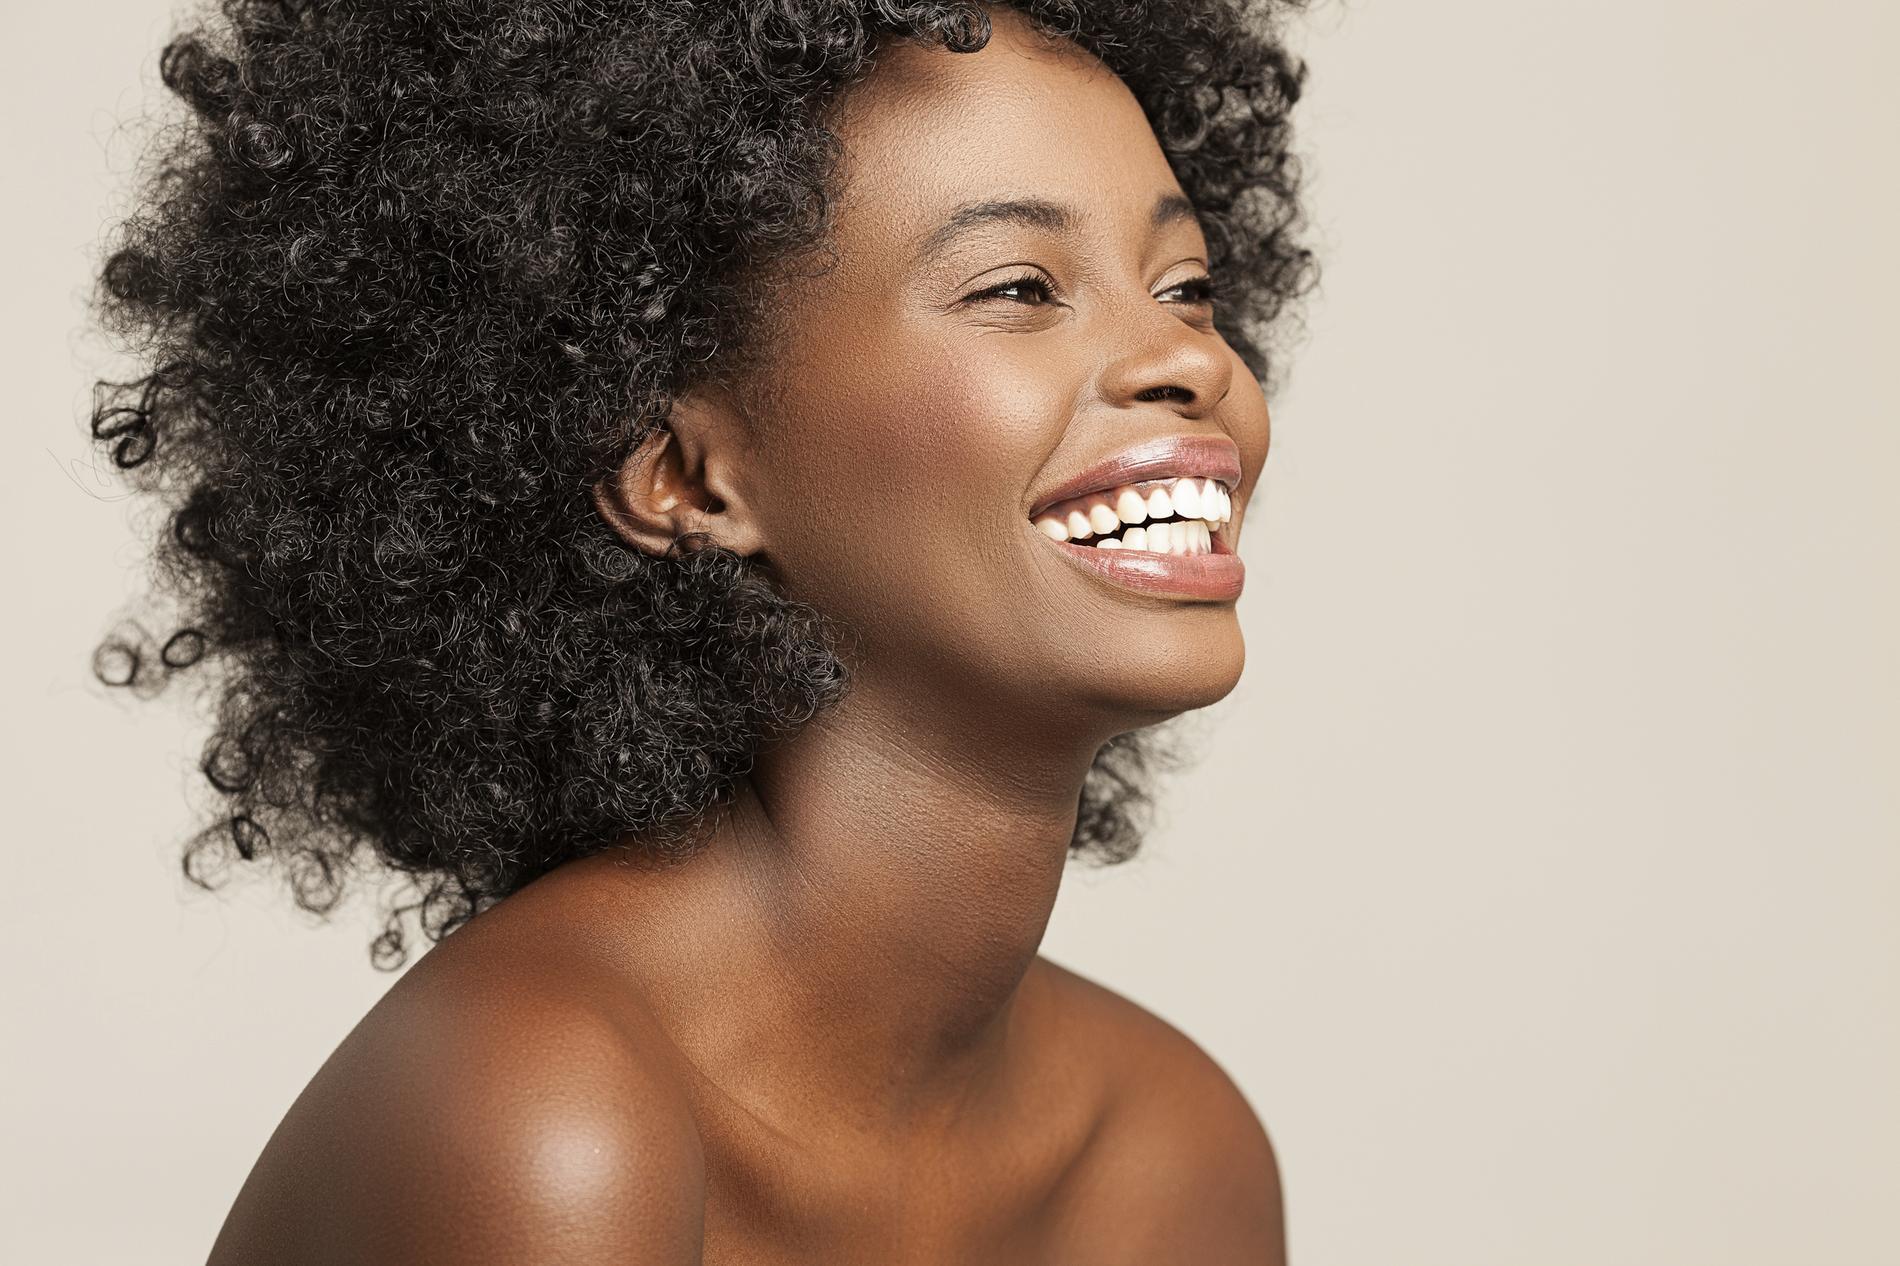 Quelle Coiffure Adopter Pour Des Cheveux Afros Madame Figaro